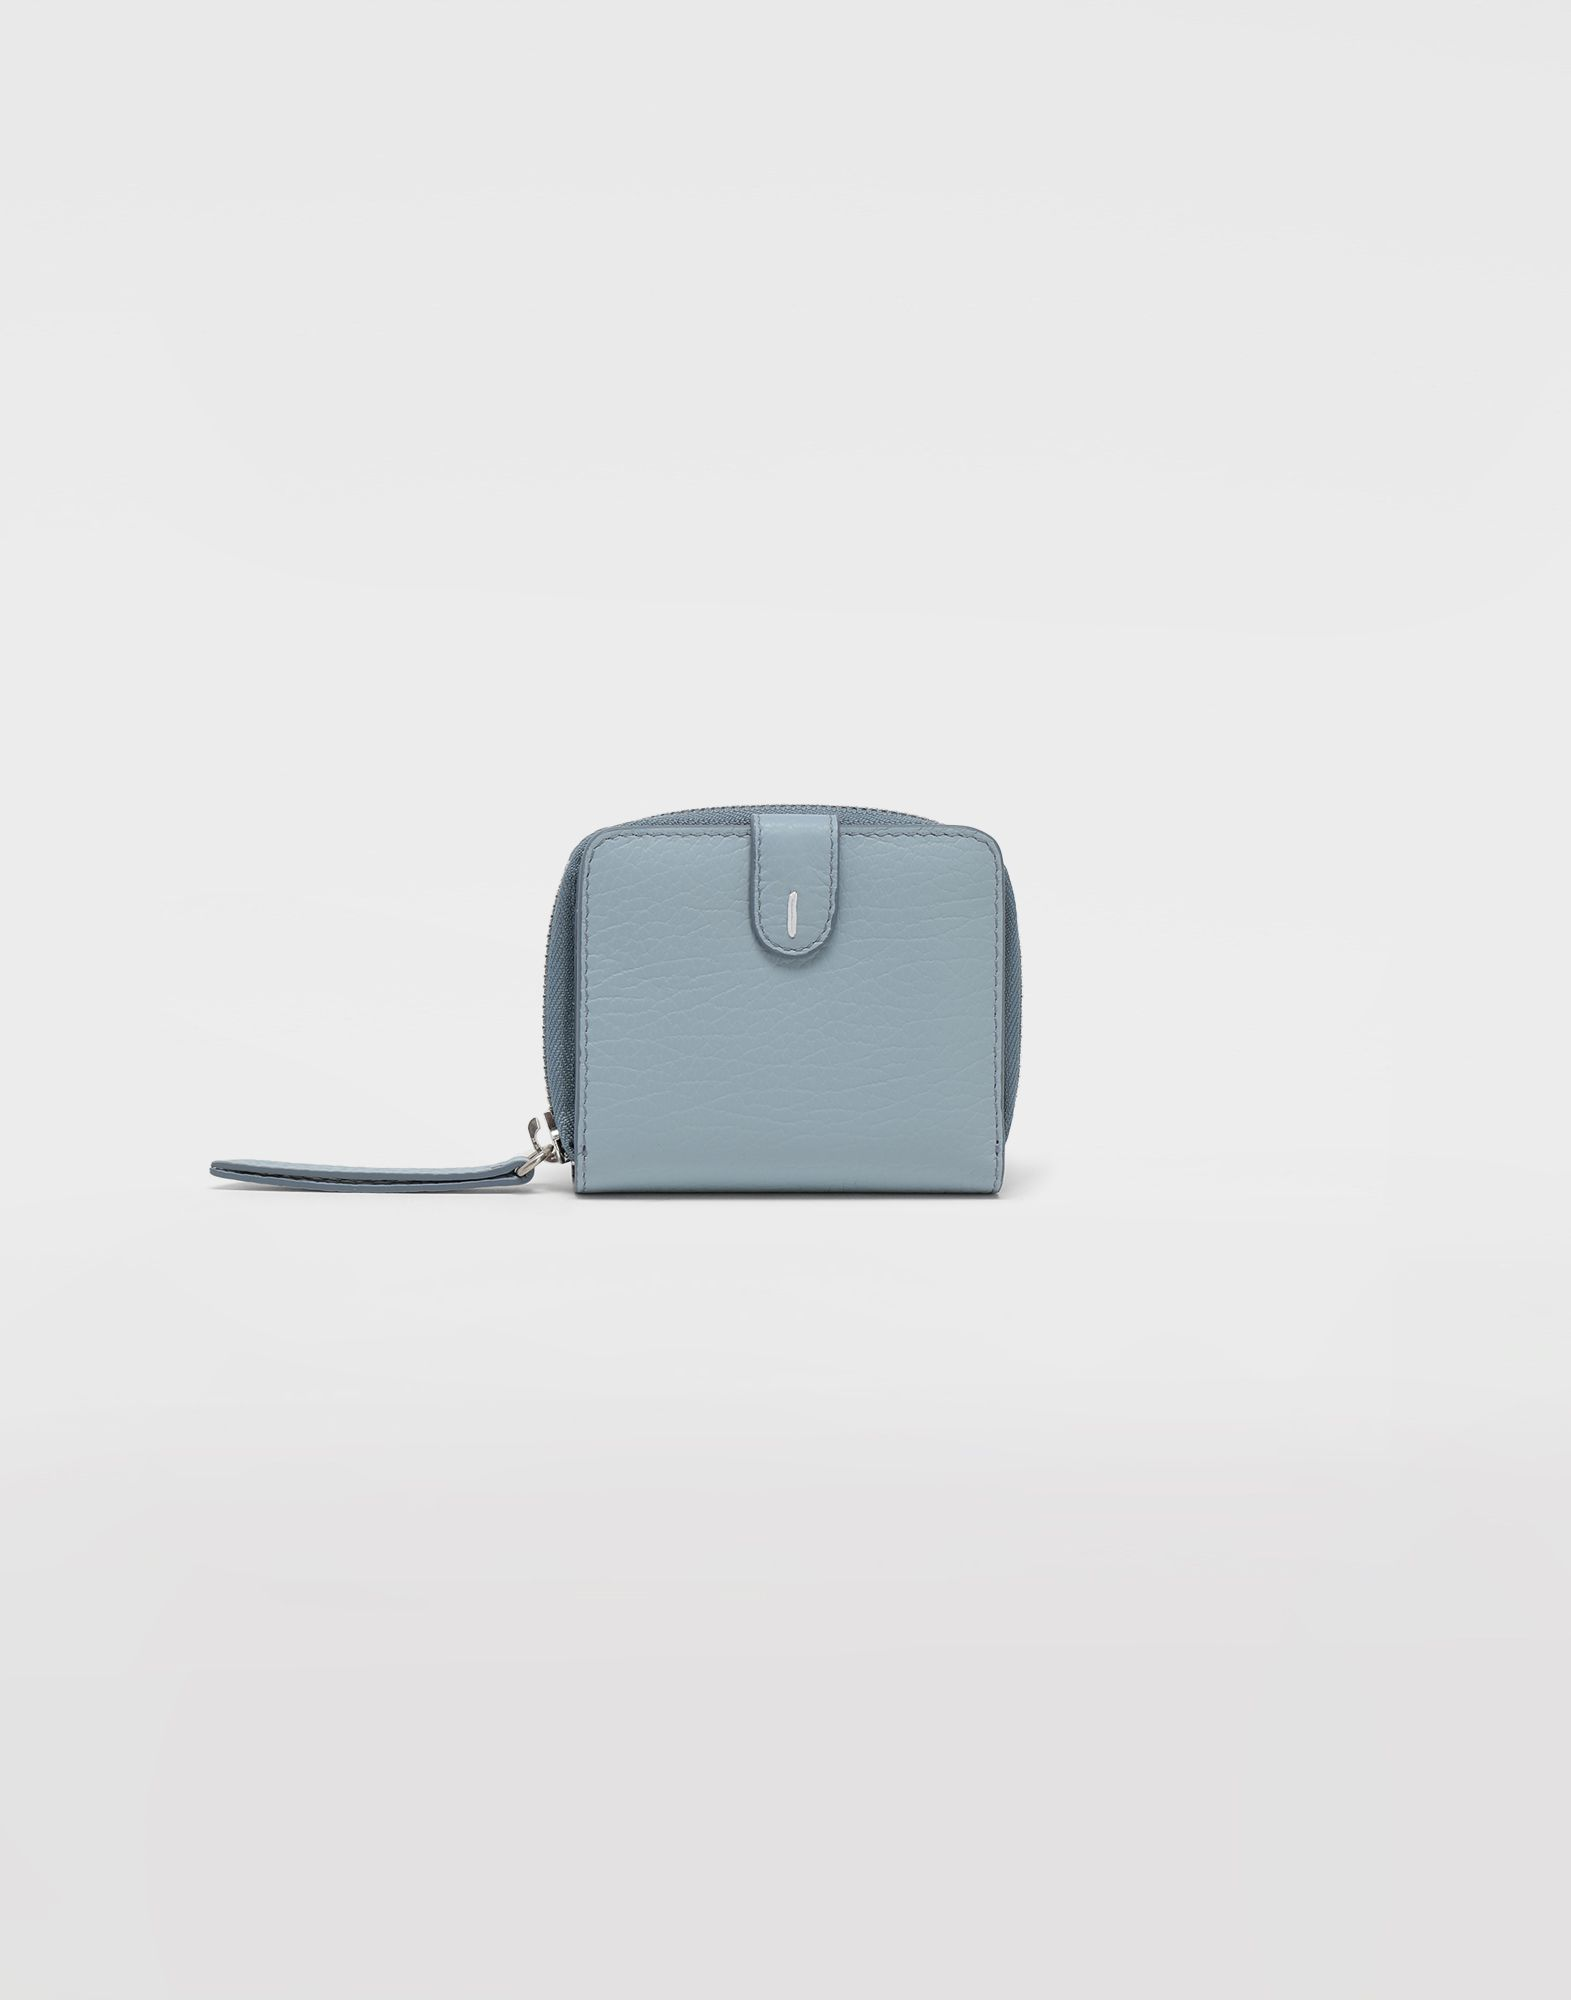 MAISON MARGIELA Leather zip-around wallet Wallets Woman f